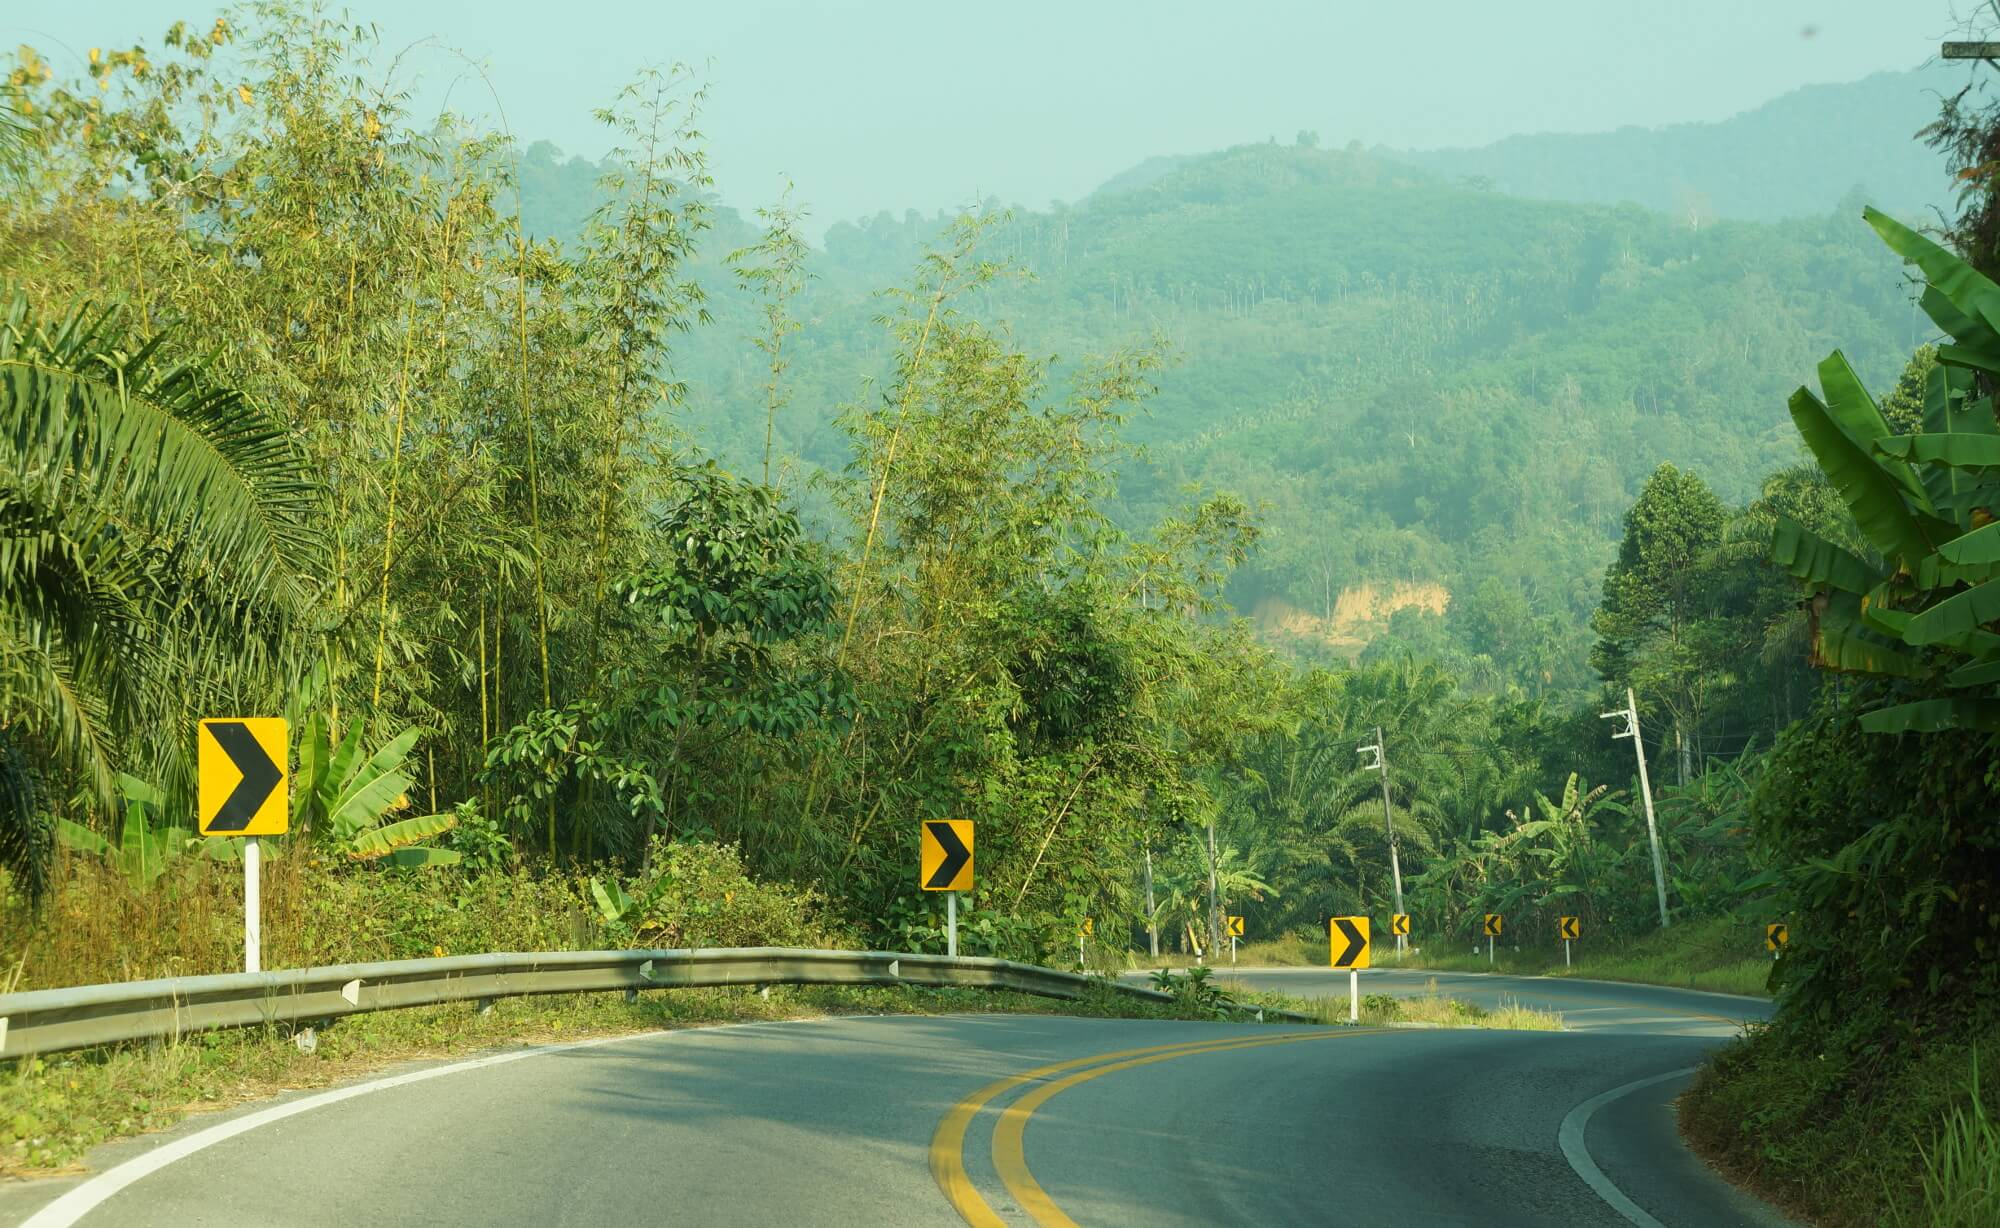 tajlandia-gora-dol